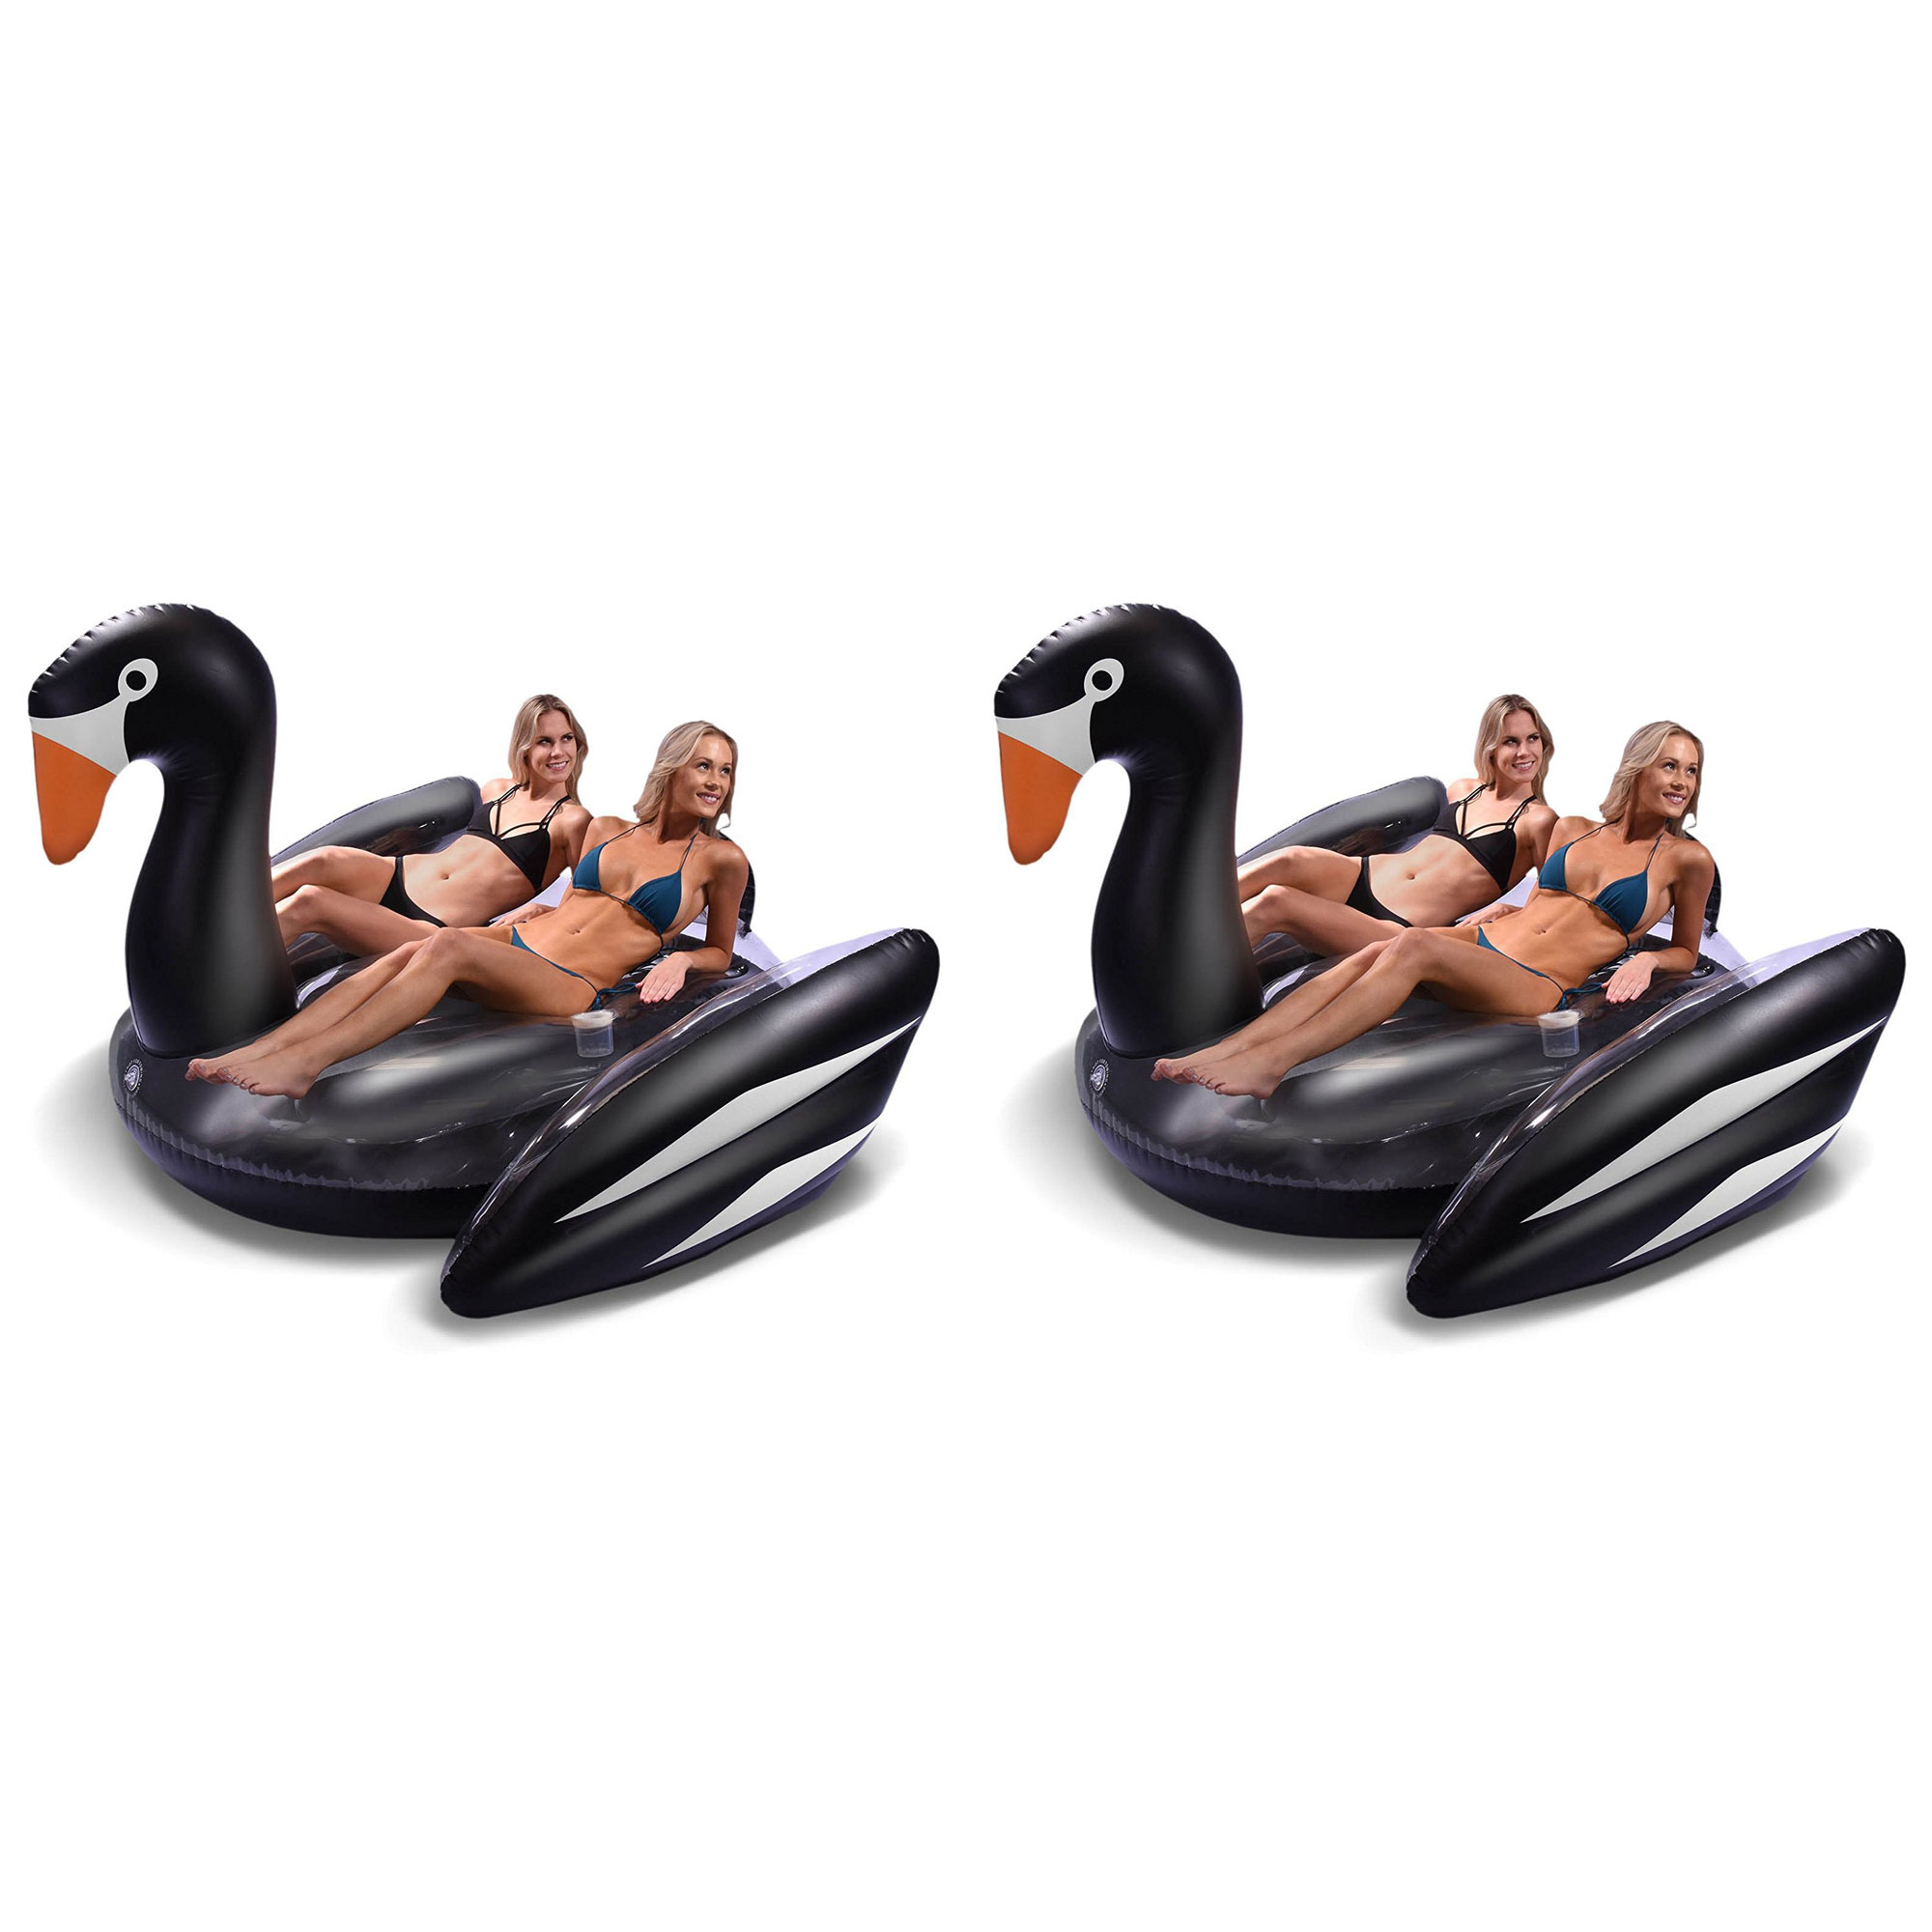 GoFloats Giant Large Inflatable Voyage Swan Pool Lake Water Float Raft (2 Pack)